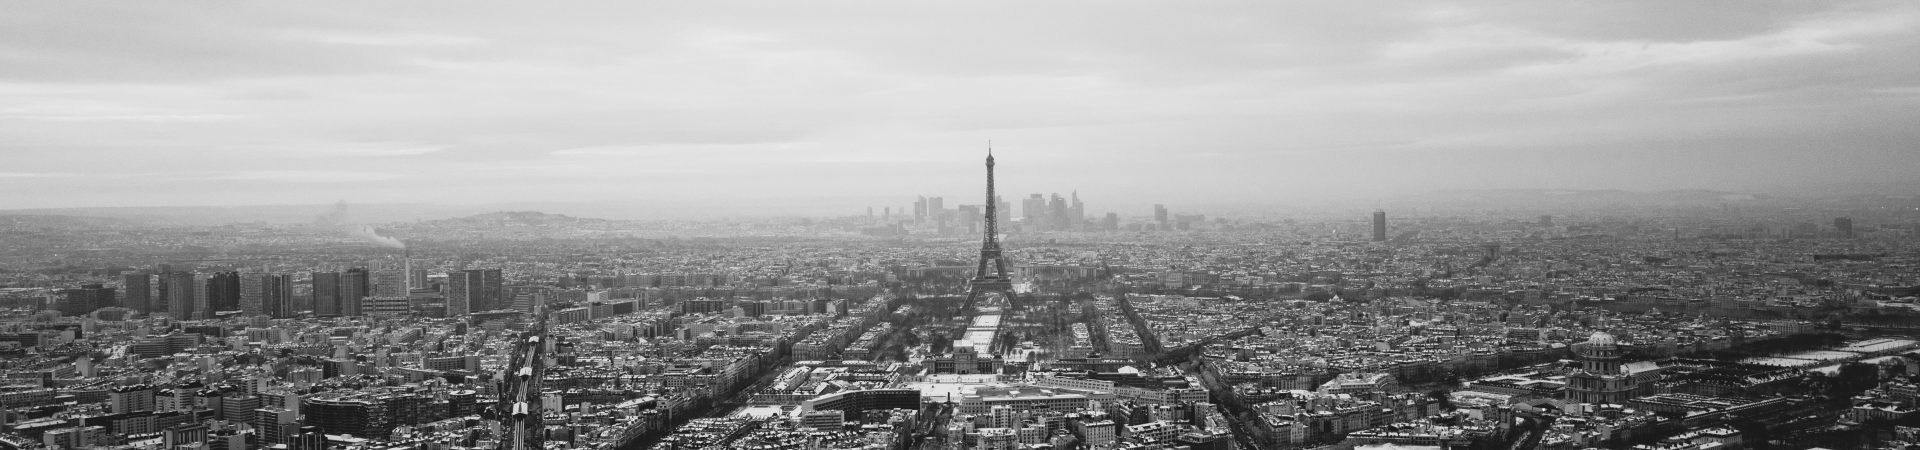 områder i Paris